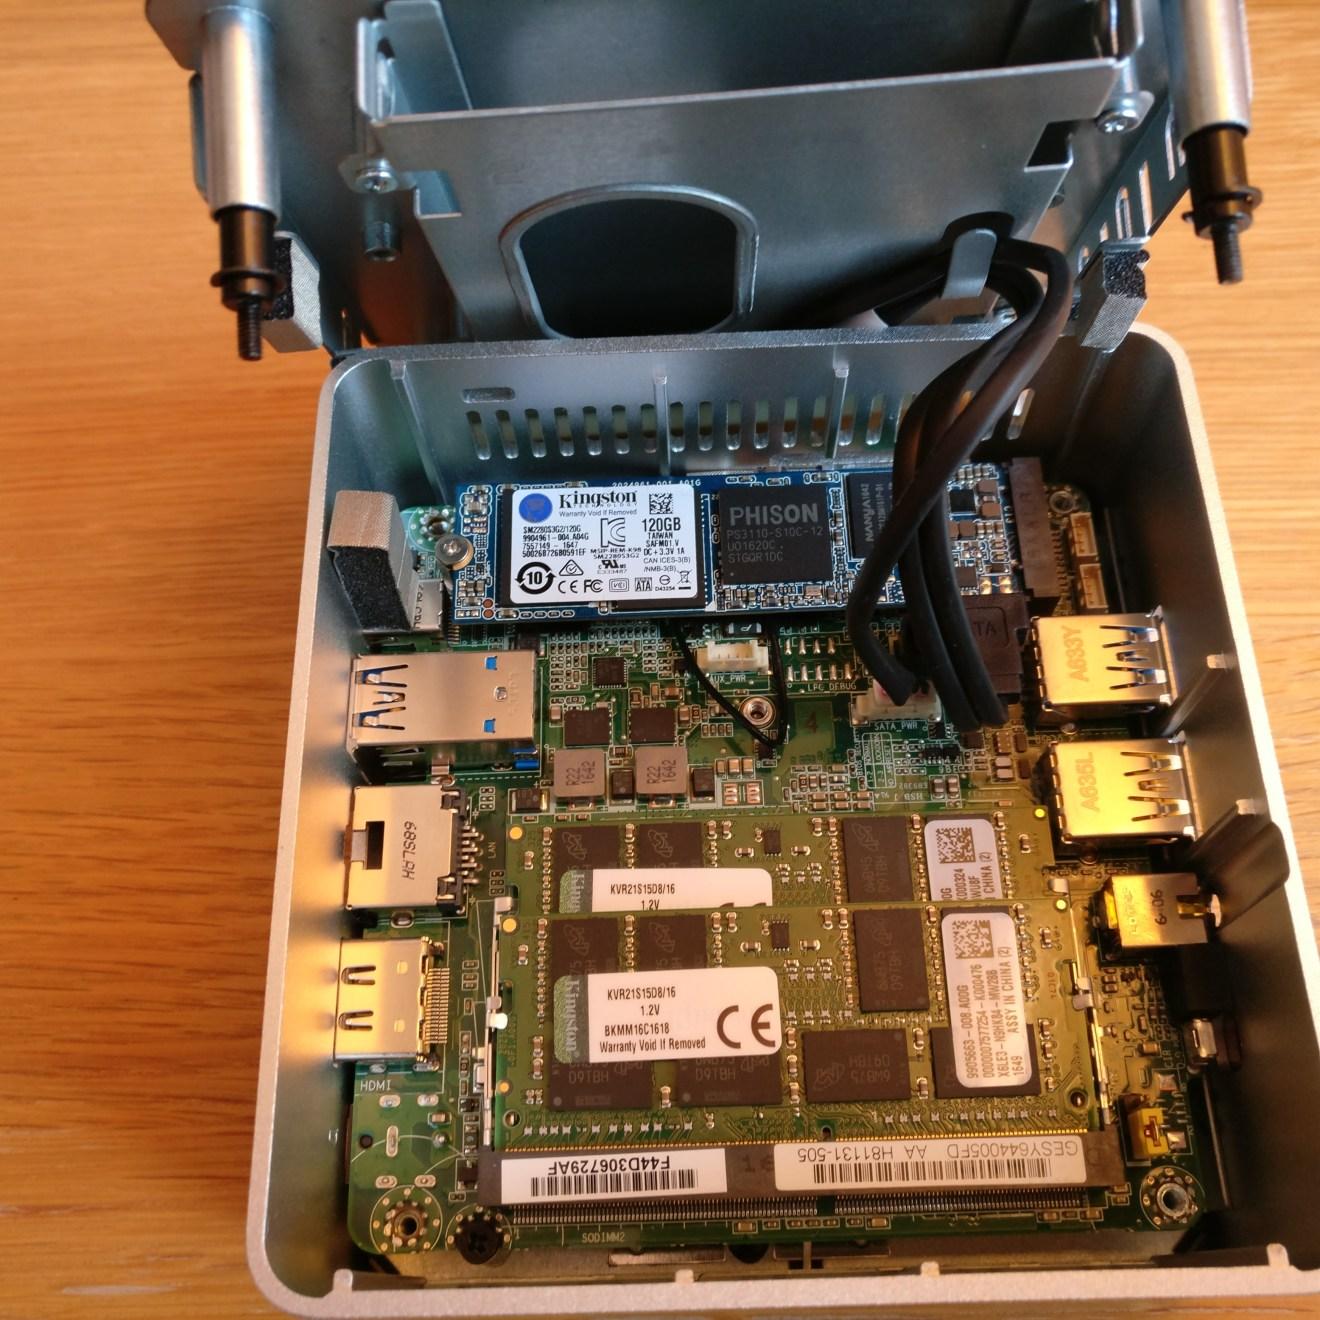 domalab.com intel nuc home lab Intel NUC